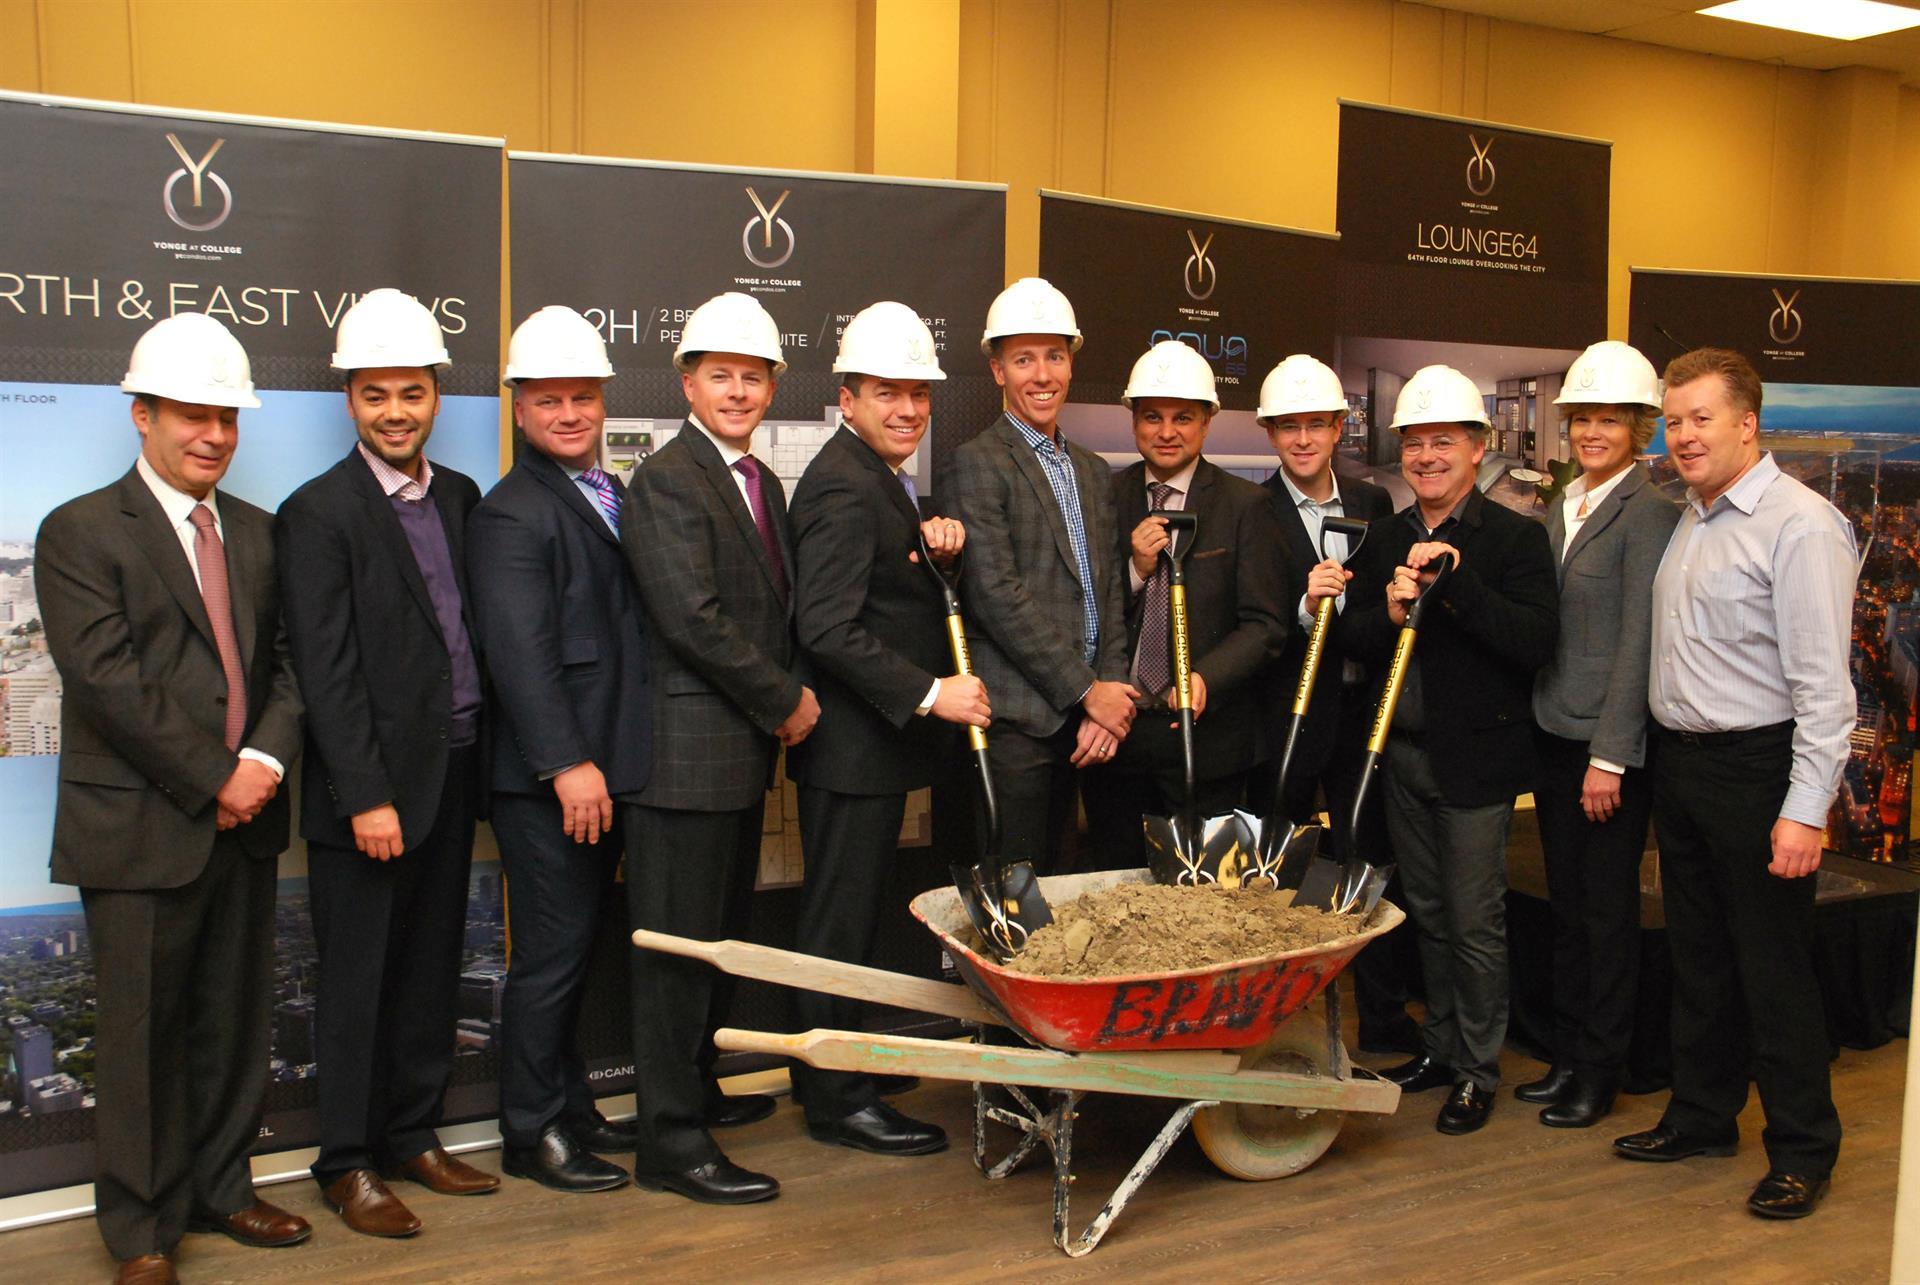 Canderel Breaks Ground at YC Condos in Toronto! Image